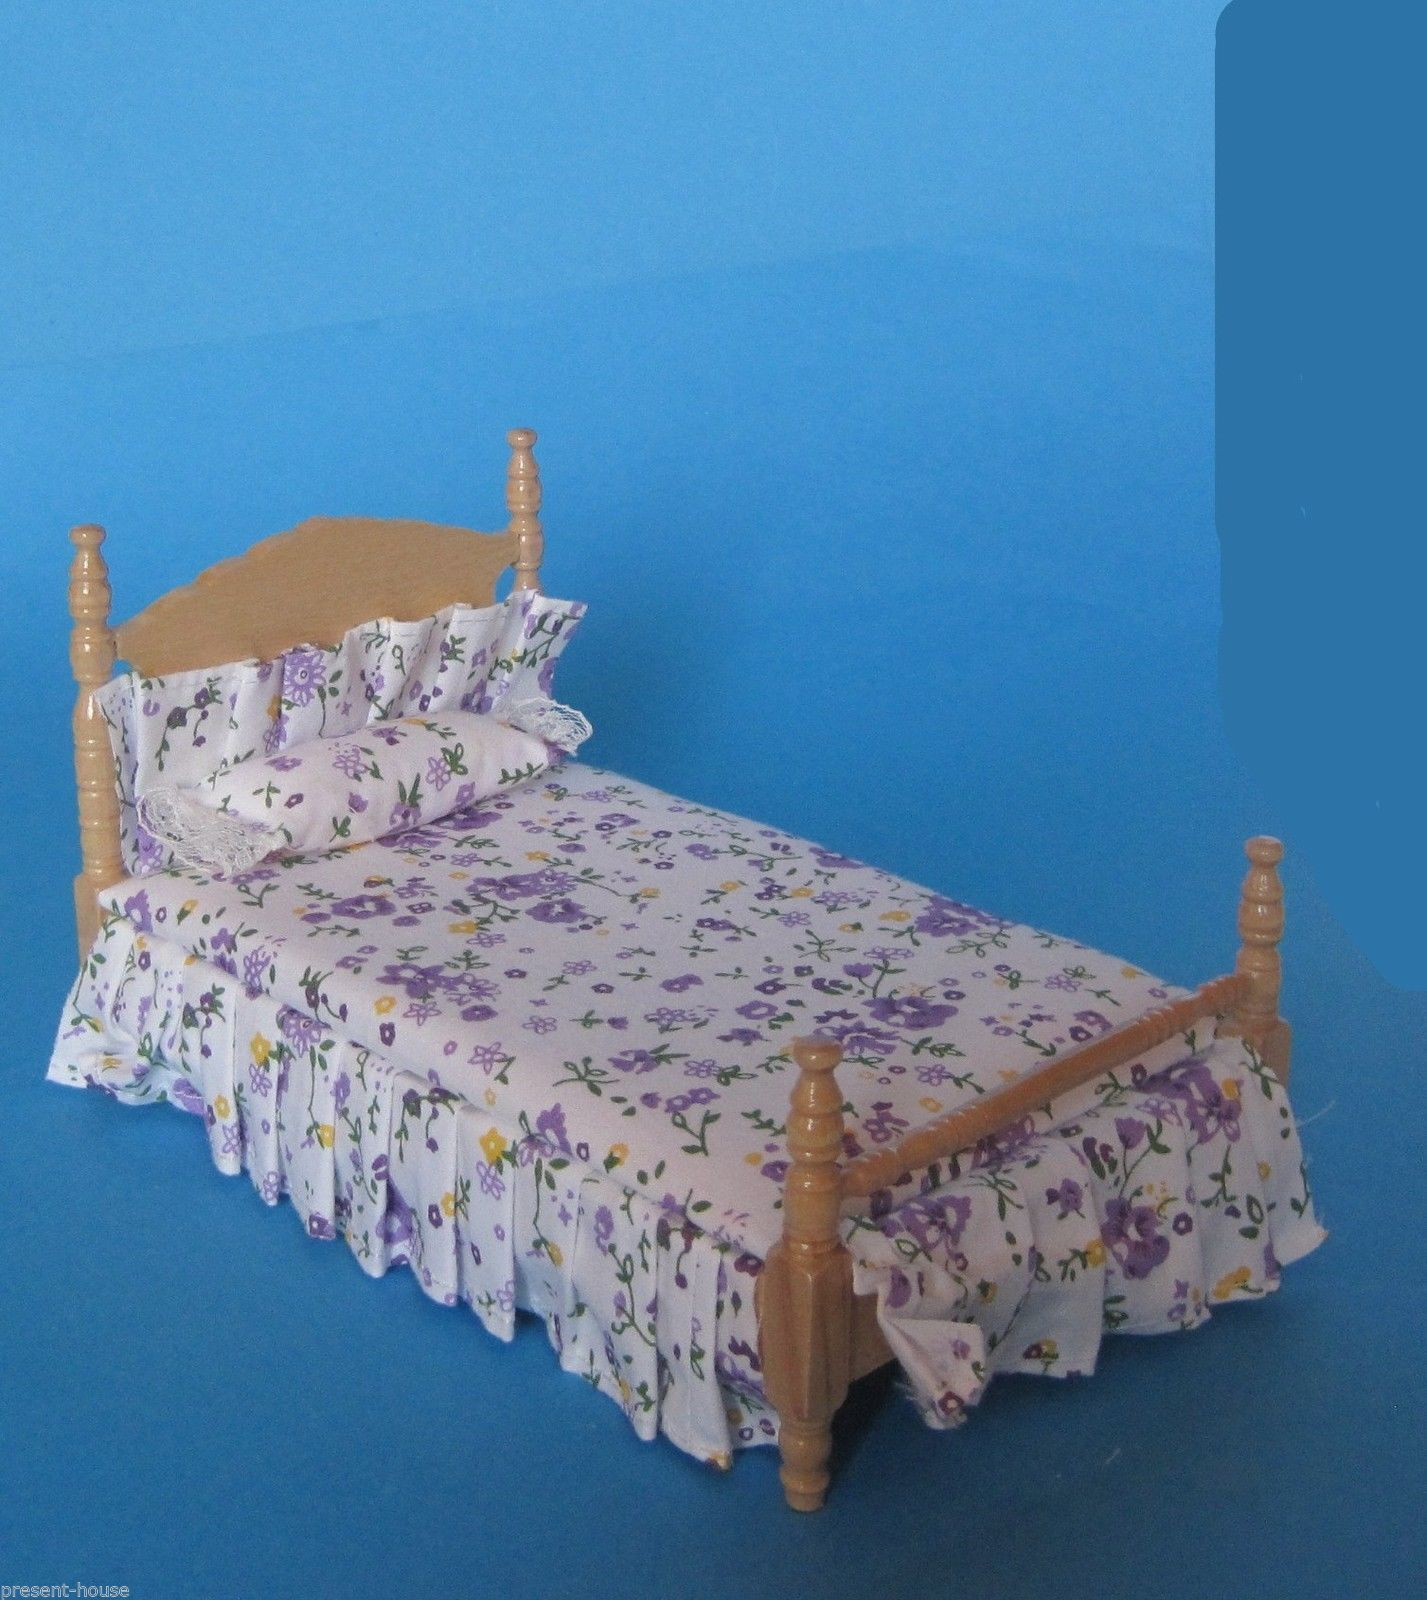 grosses puppenbett schlafzimmer naturholz lackiert puppenhausmöbel, Schlafzimmer entwurf